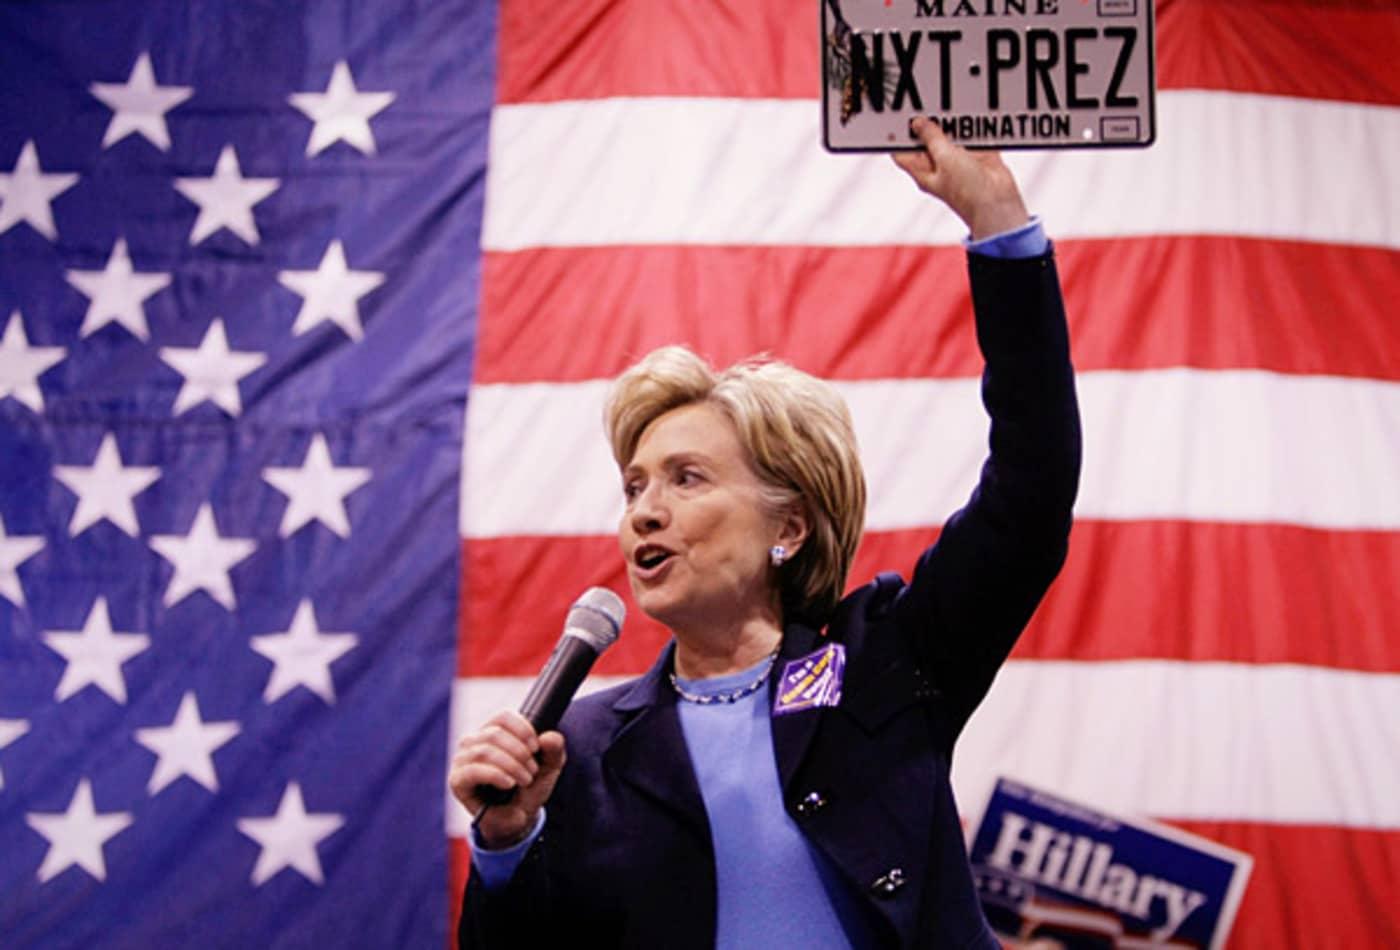 Hillary-Clinton-Richest-Presidential-Candidates.jpg